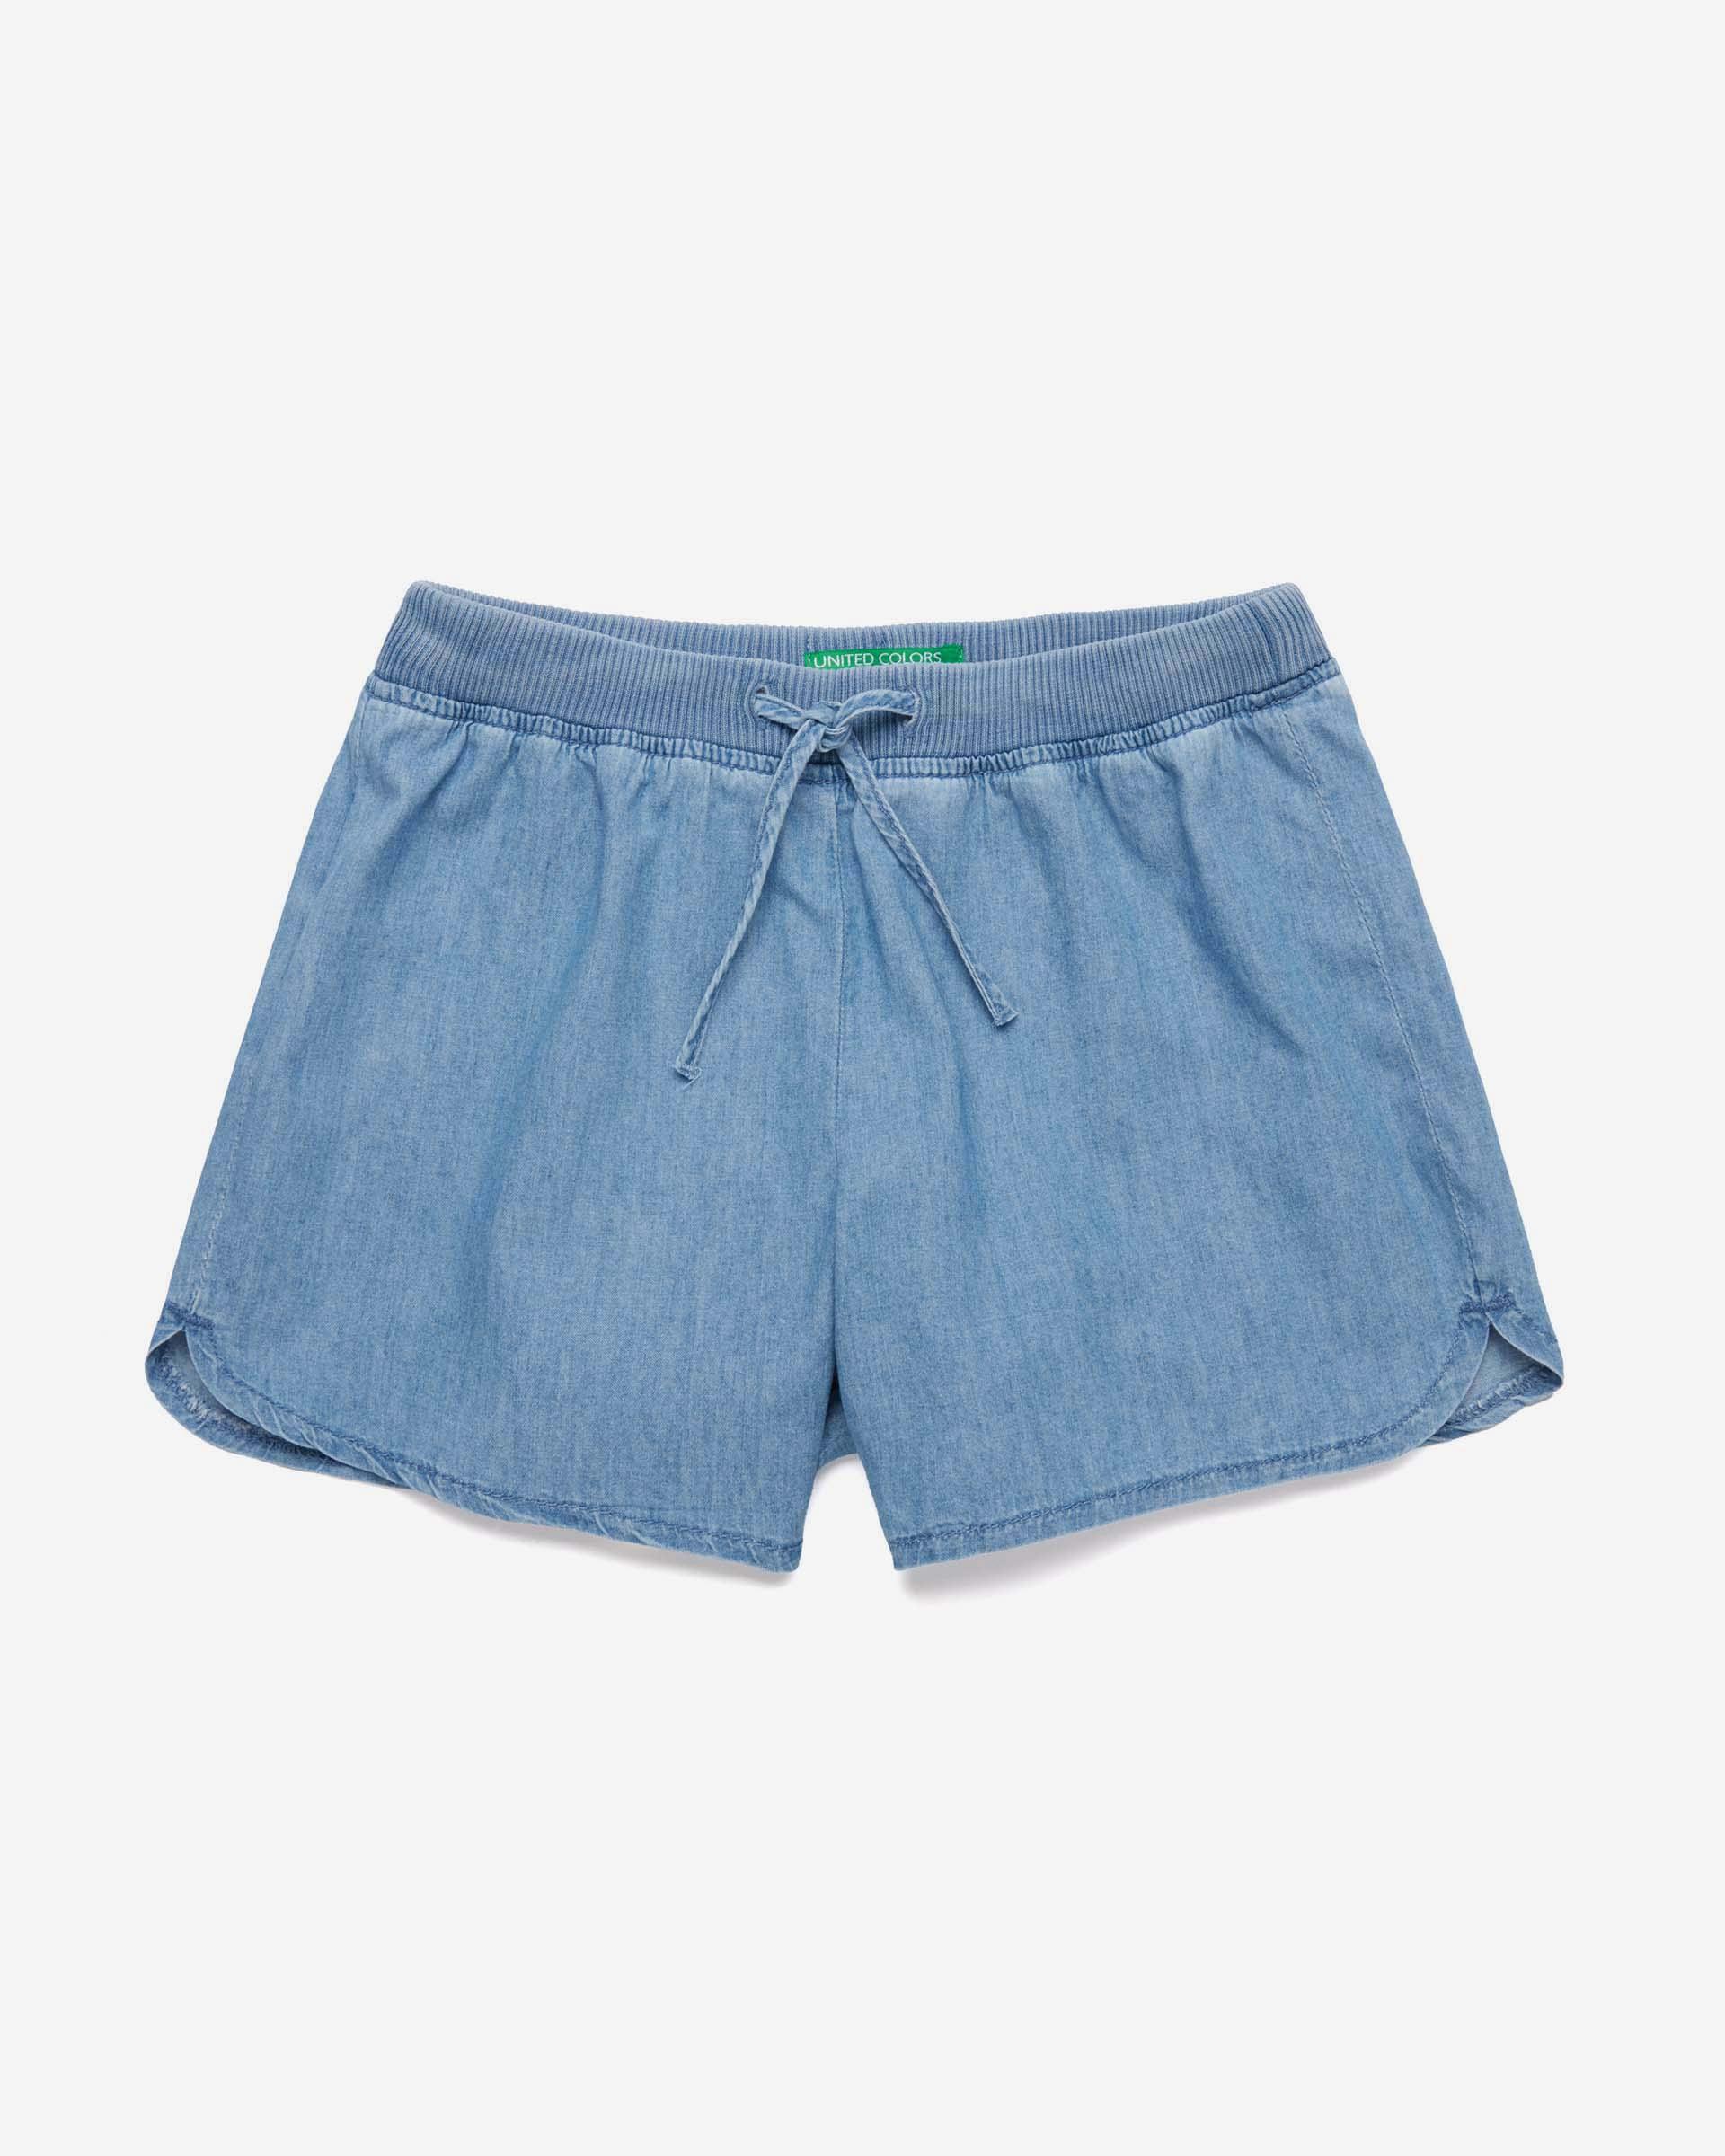 Купить 20P_4DHJ59E30_902, Шорты для девочек Benetton 4DHJ59E30_902 р-р 140, United Colors of Benetton